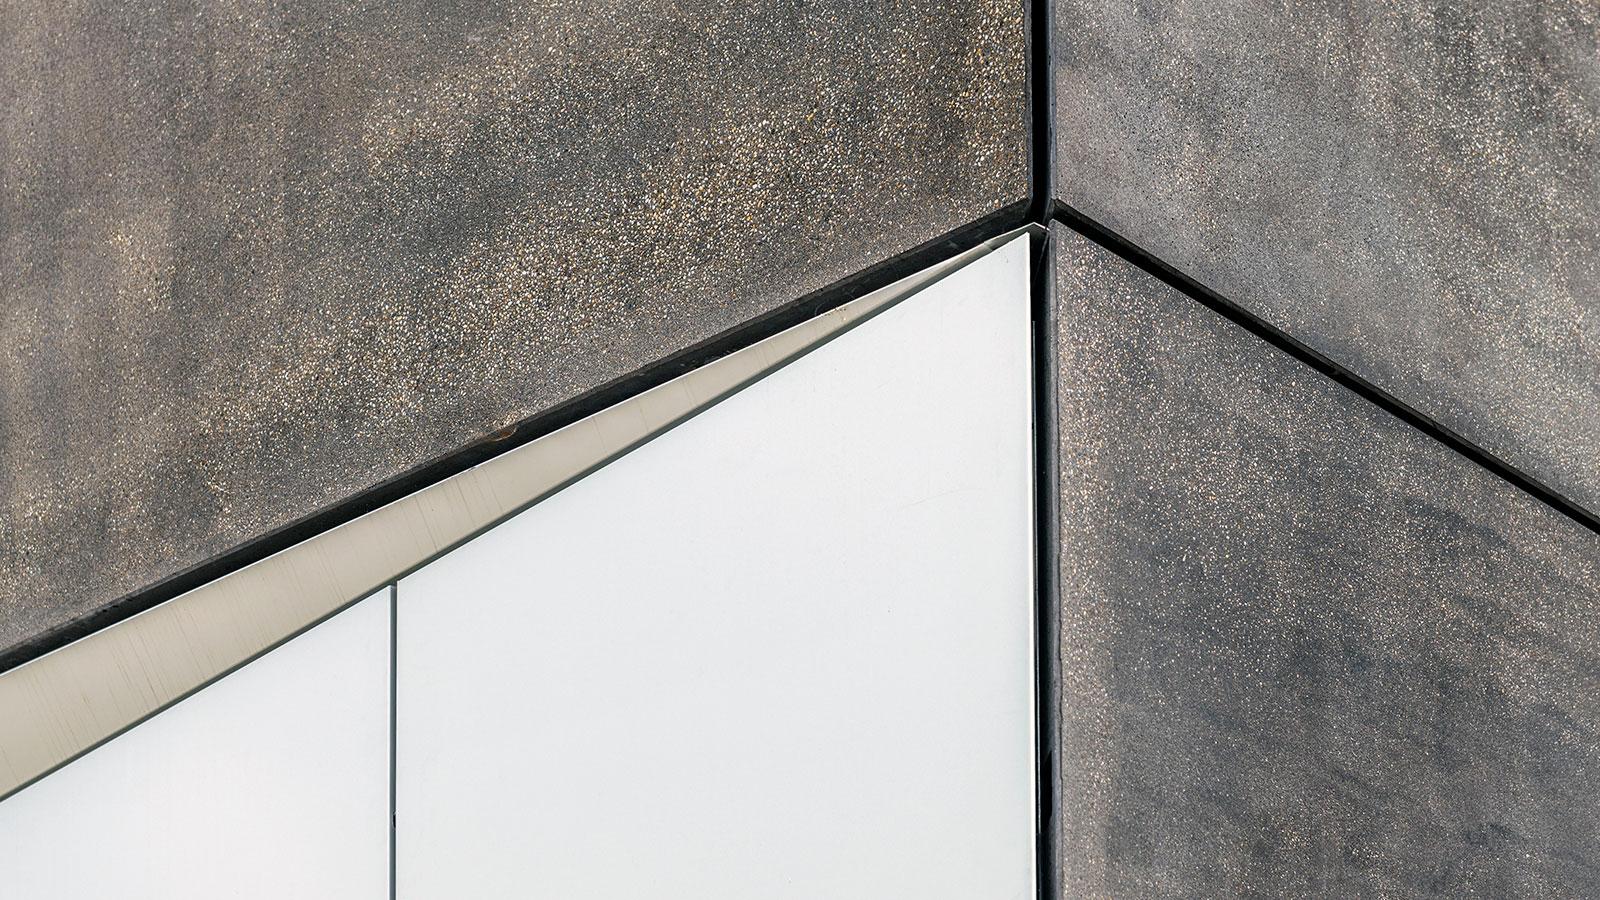 zme-coburg-fassade-architekturbeton-detail